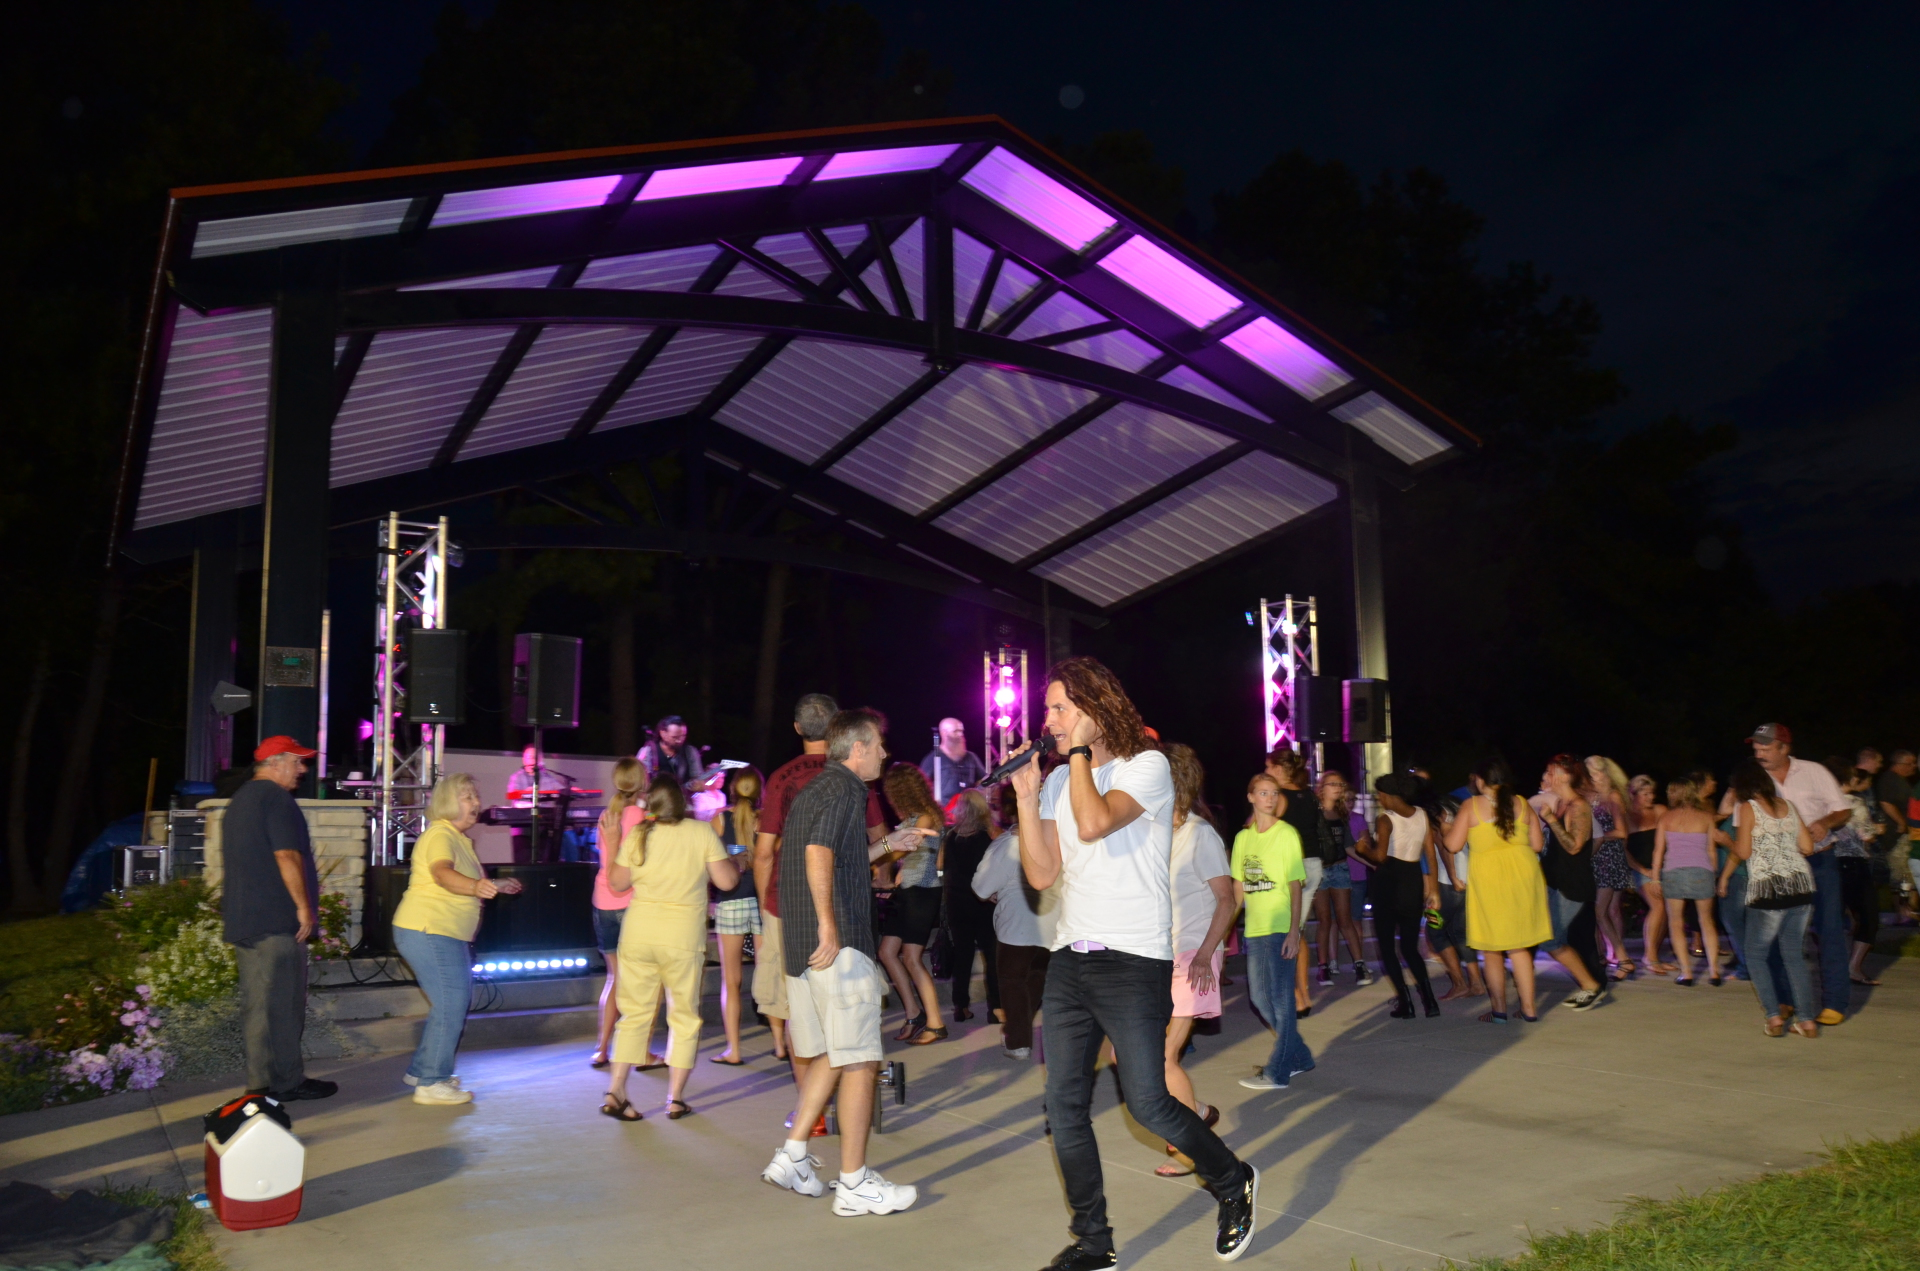 SOUTHWEST COMMUNITY FESTIVAL 2015  Click the Image for the Slideshow